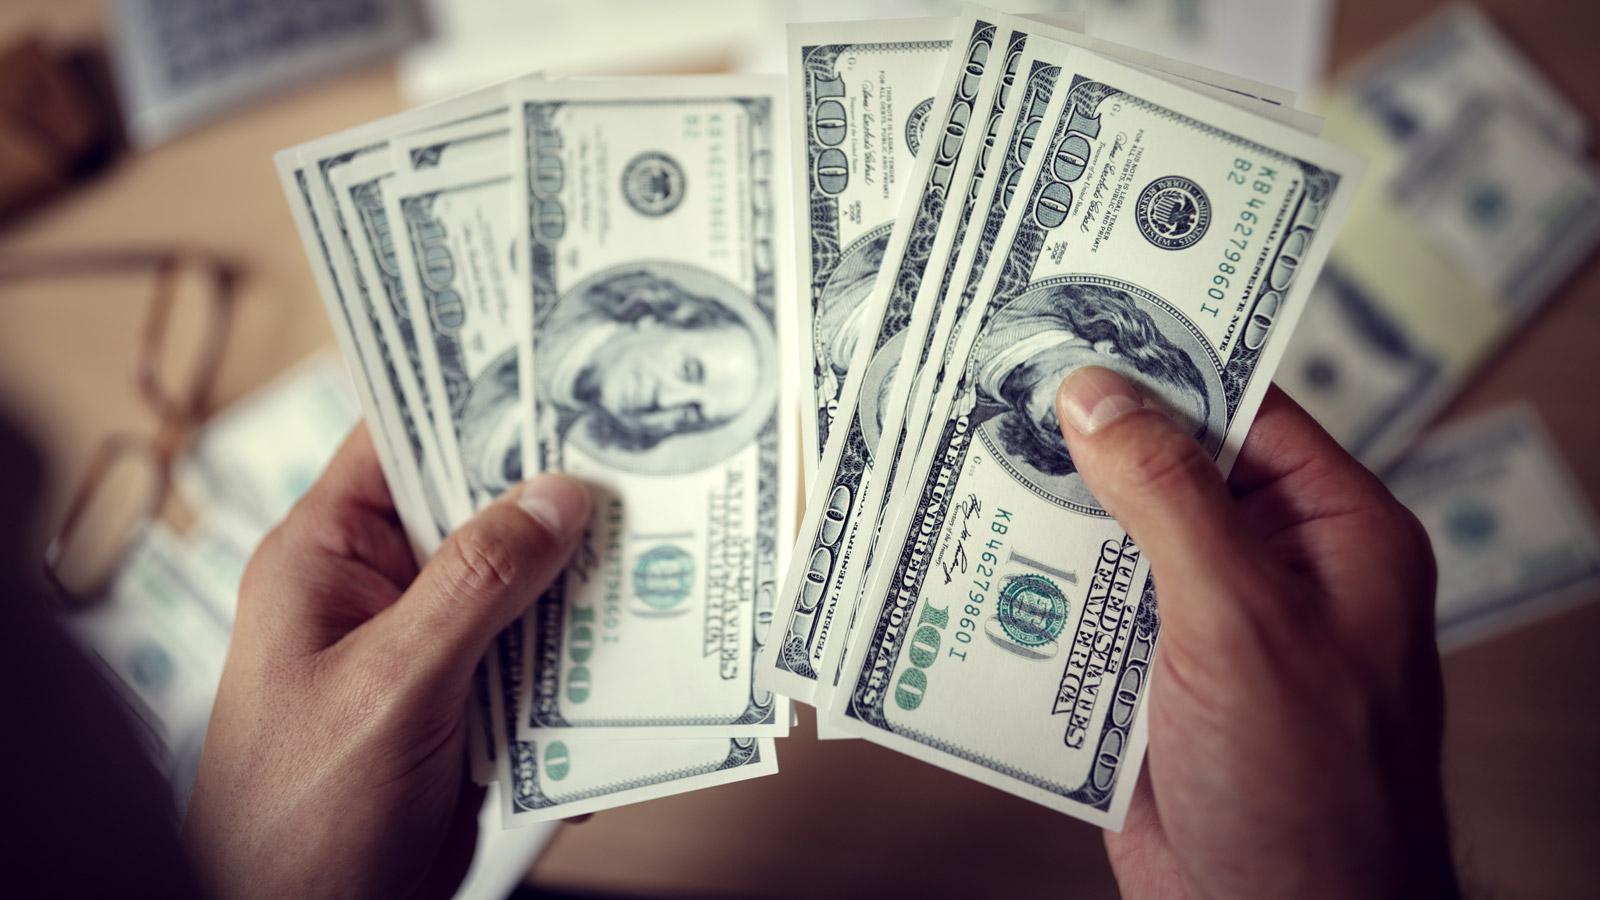 Sprawdź kto pracuje w finansach Finanse mediarun dolary finanse 2019